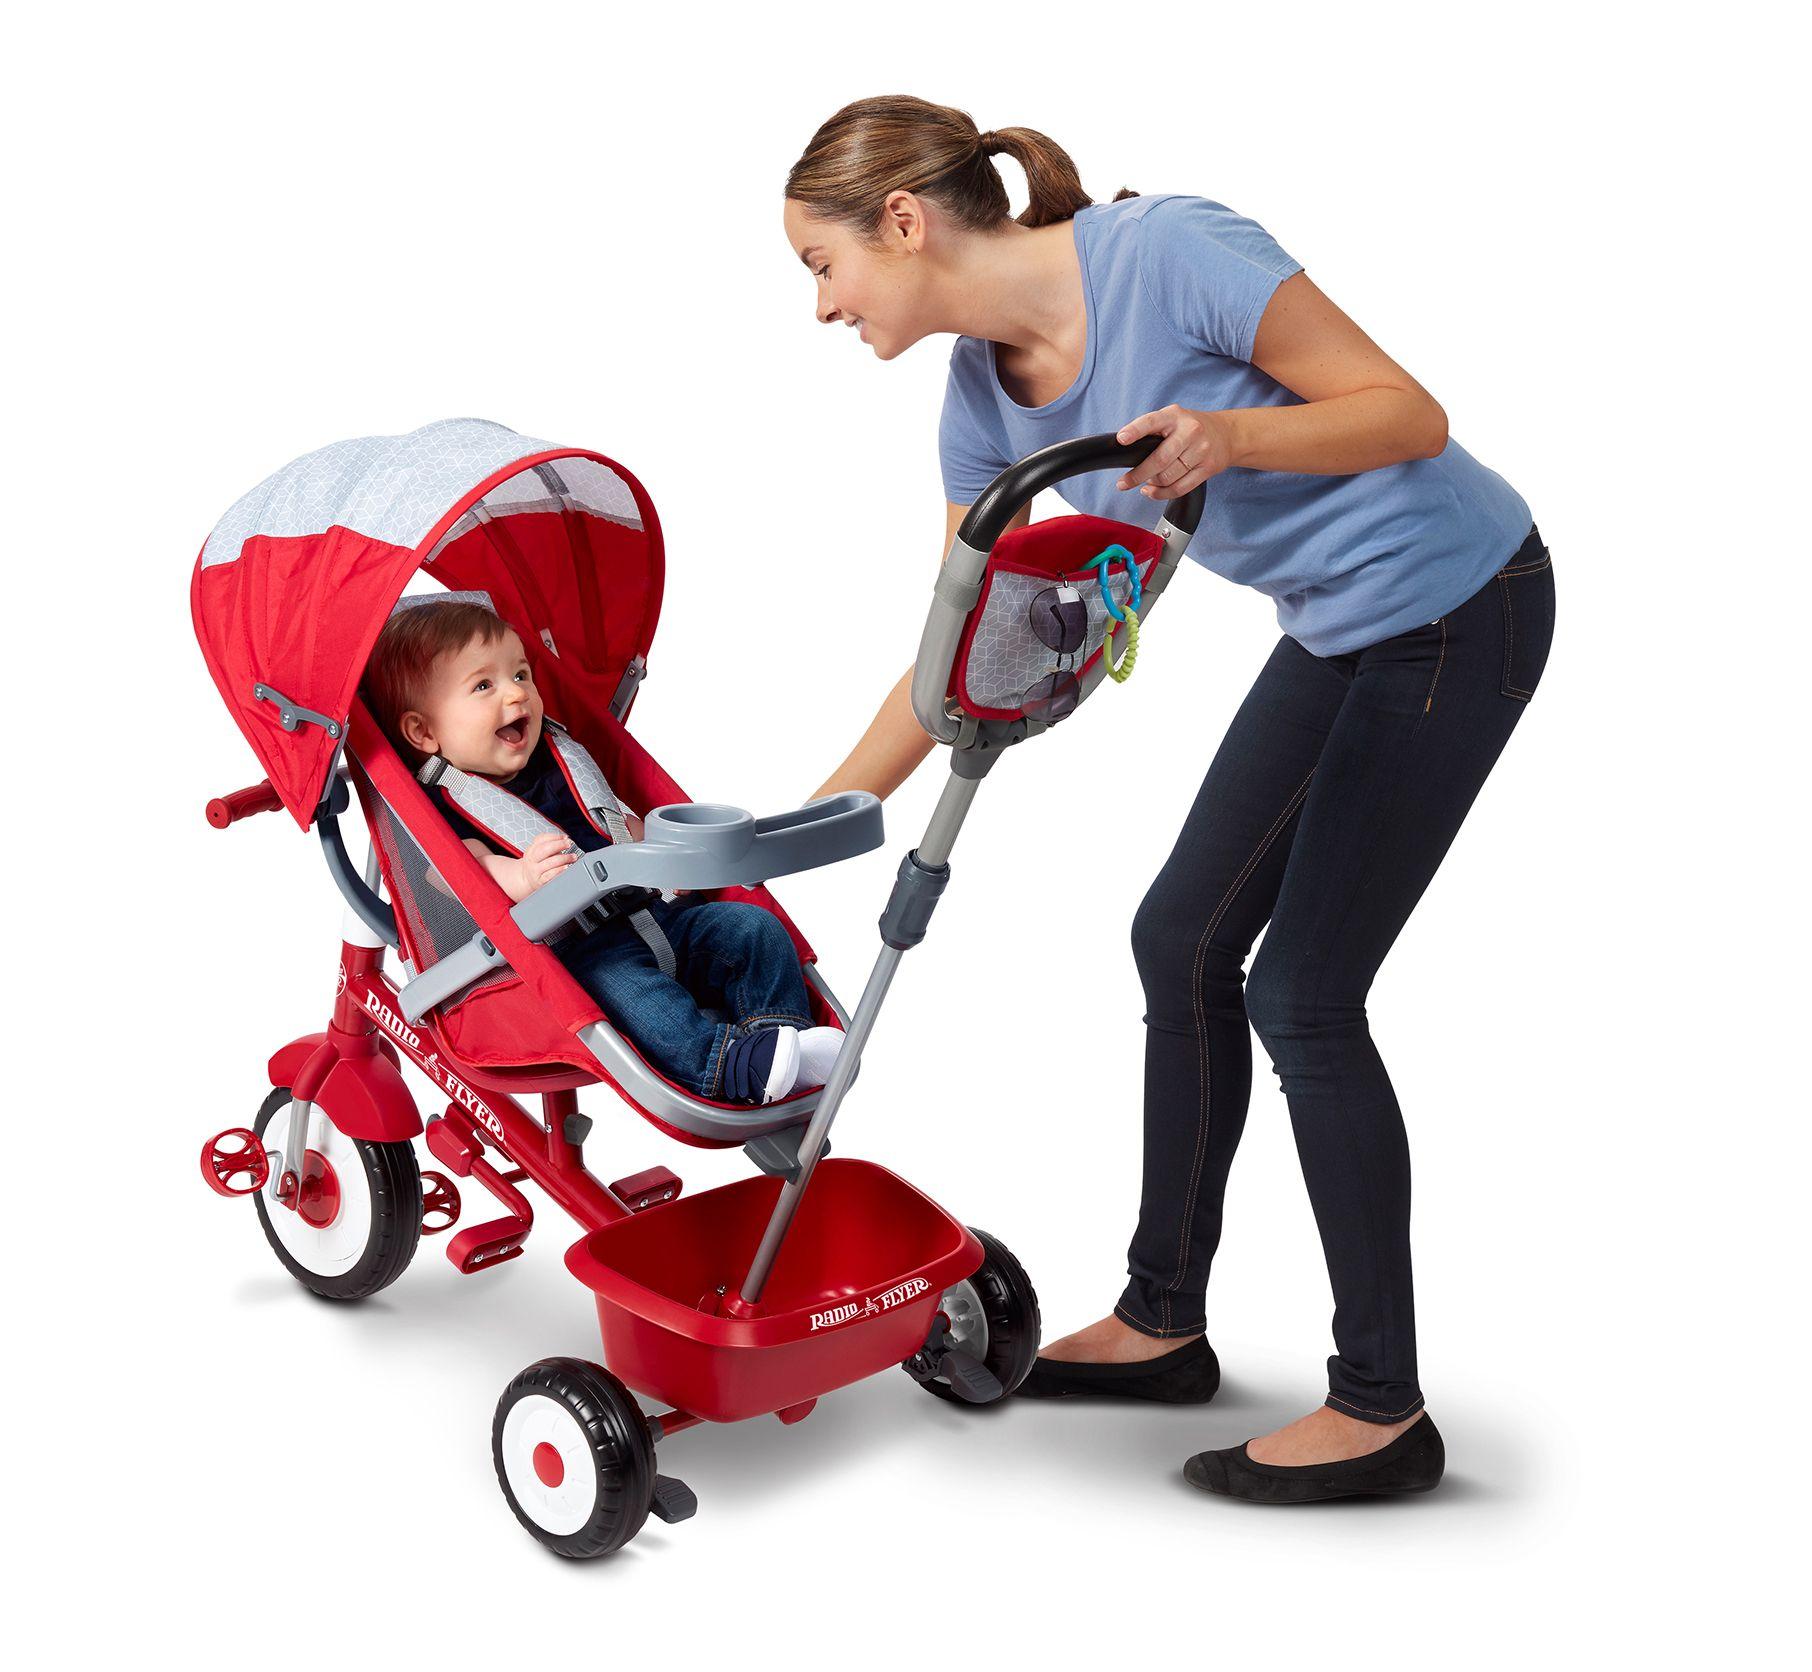 5in1 Stroll 'N Trike® Stroller toys, Radio flyer, Kids